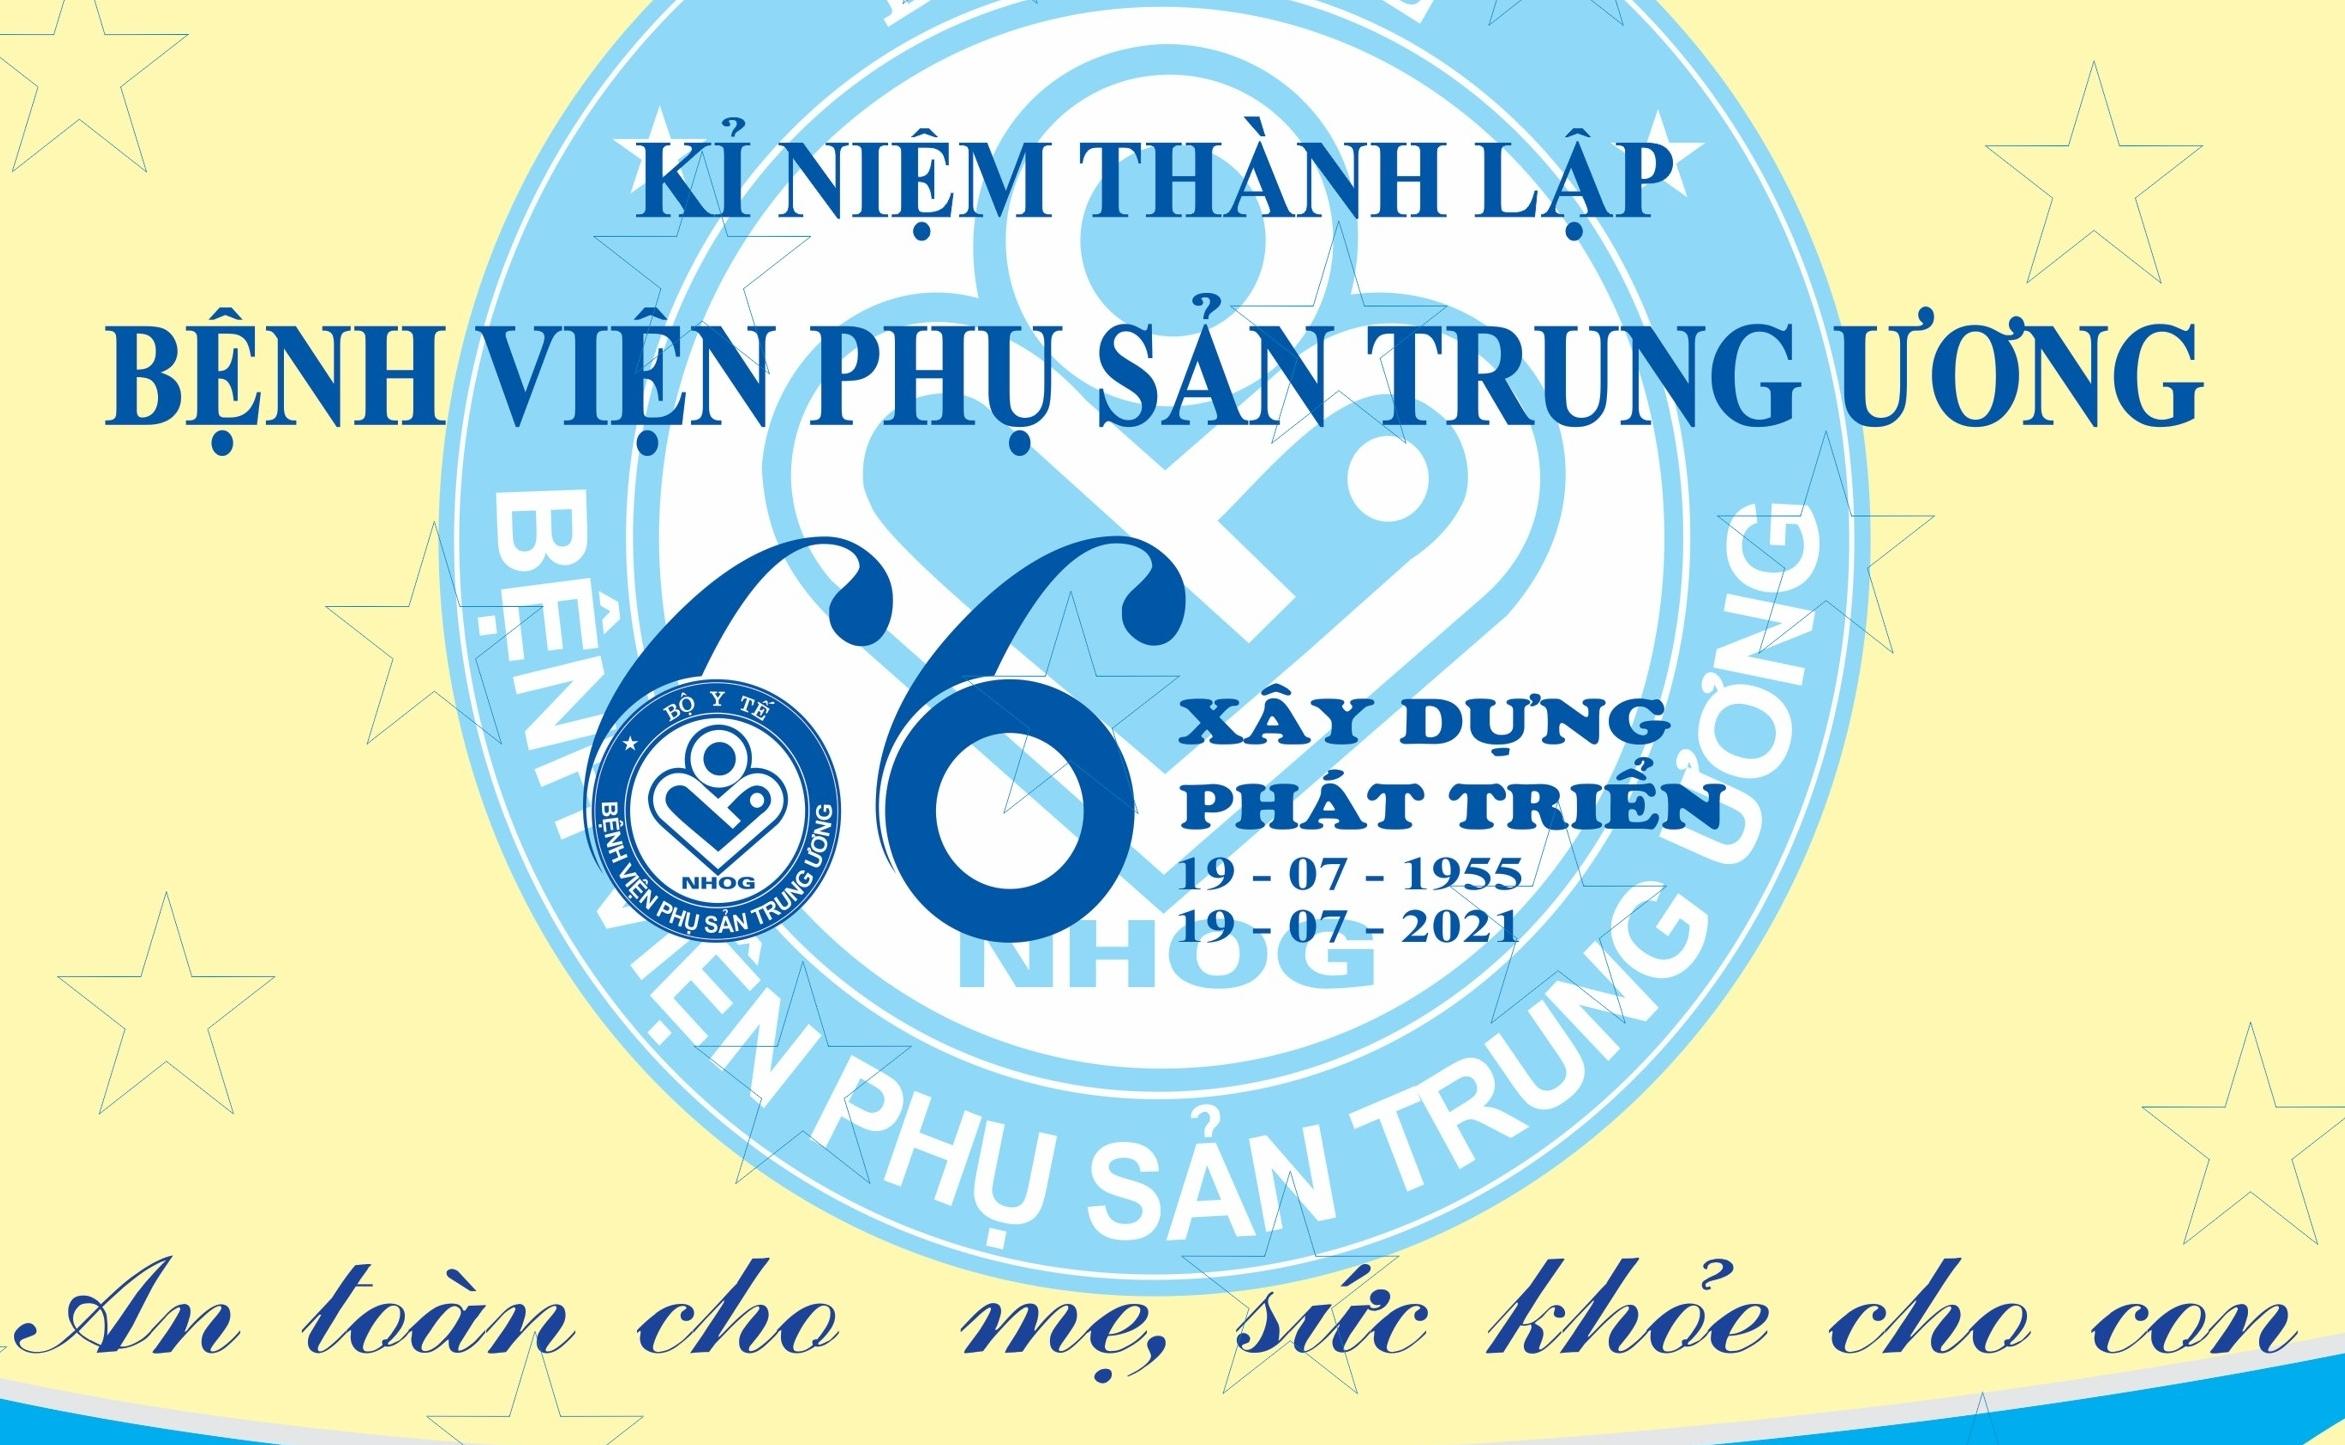 http://m.benhvienphusantrunguong.org.vn/stores/news_dataimages/vtkien/072021/20/08/croped/Picture1.jpg